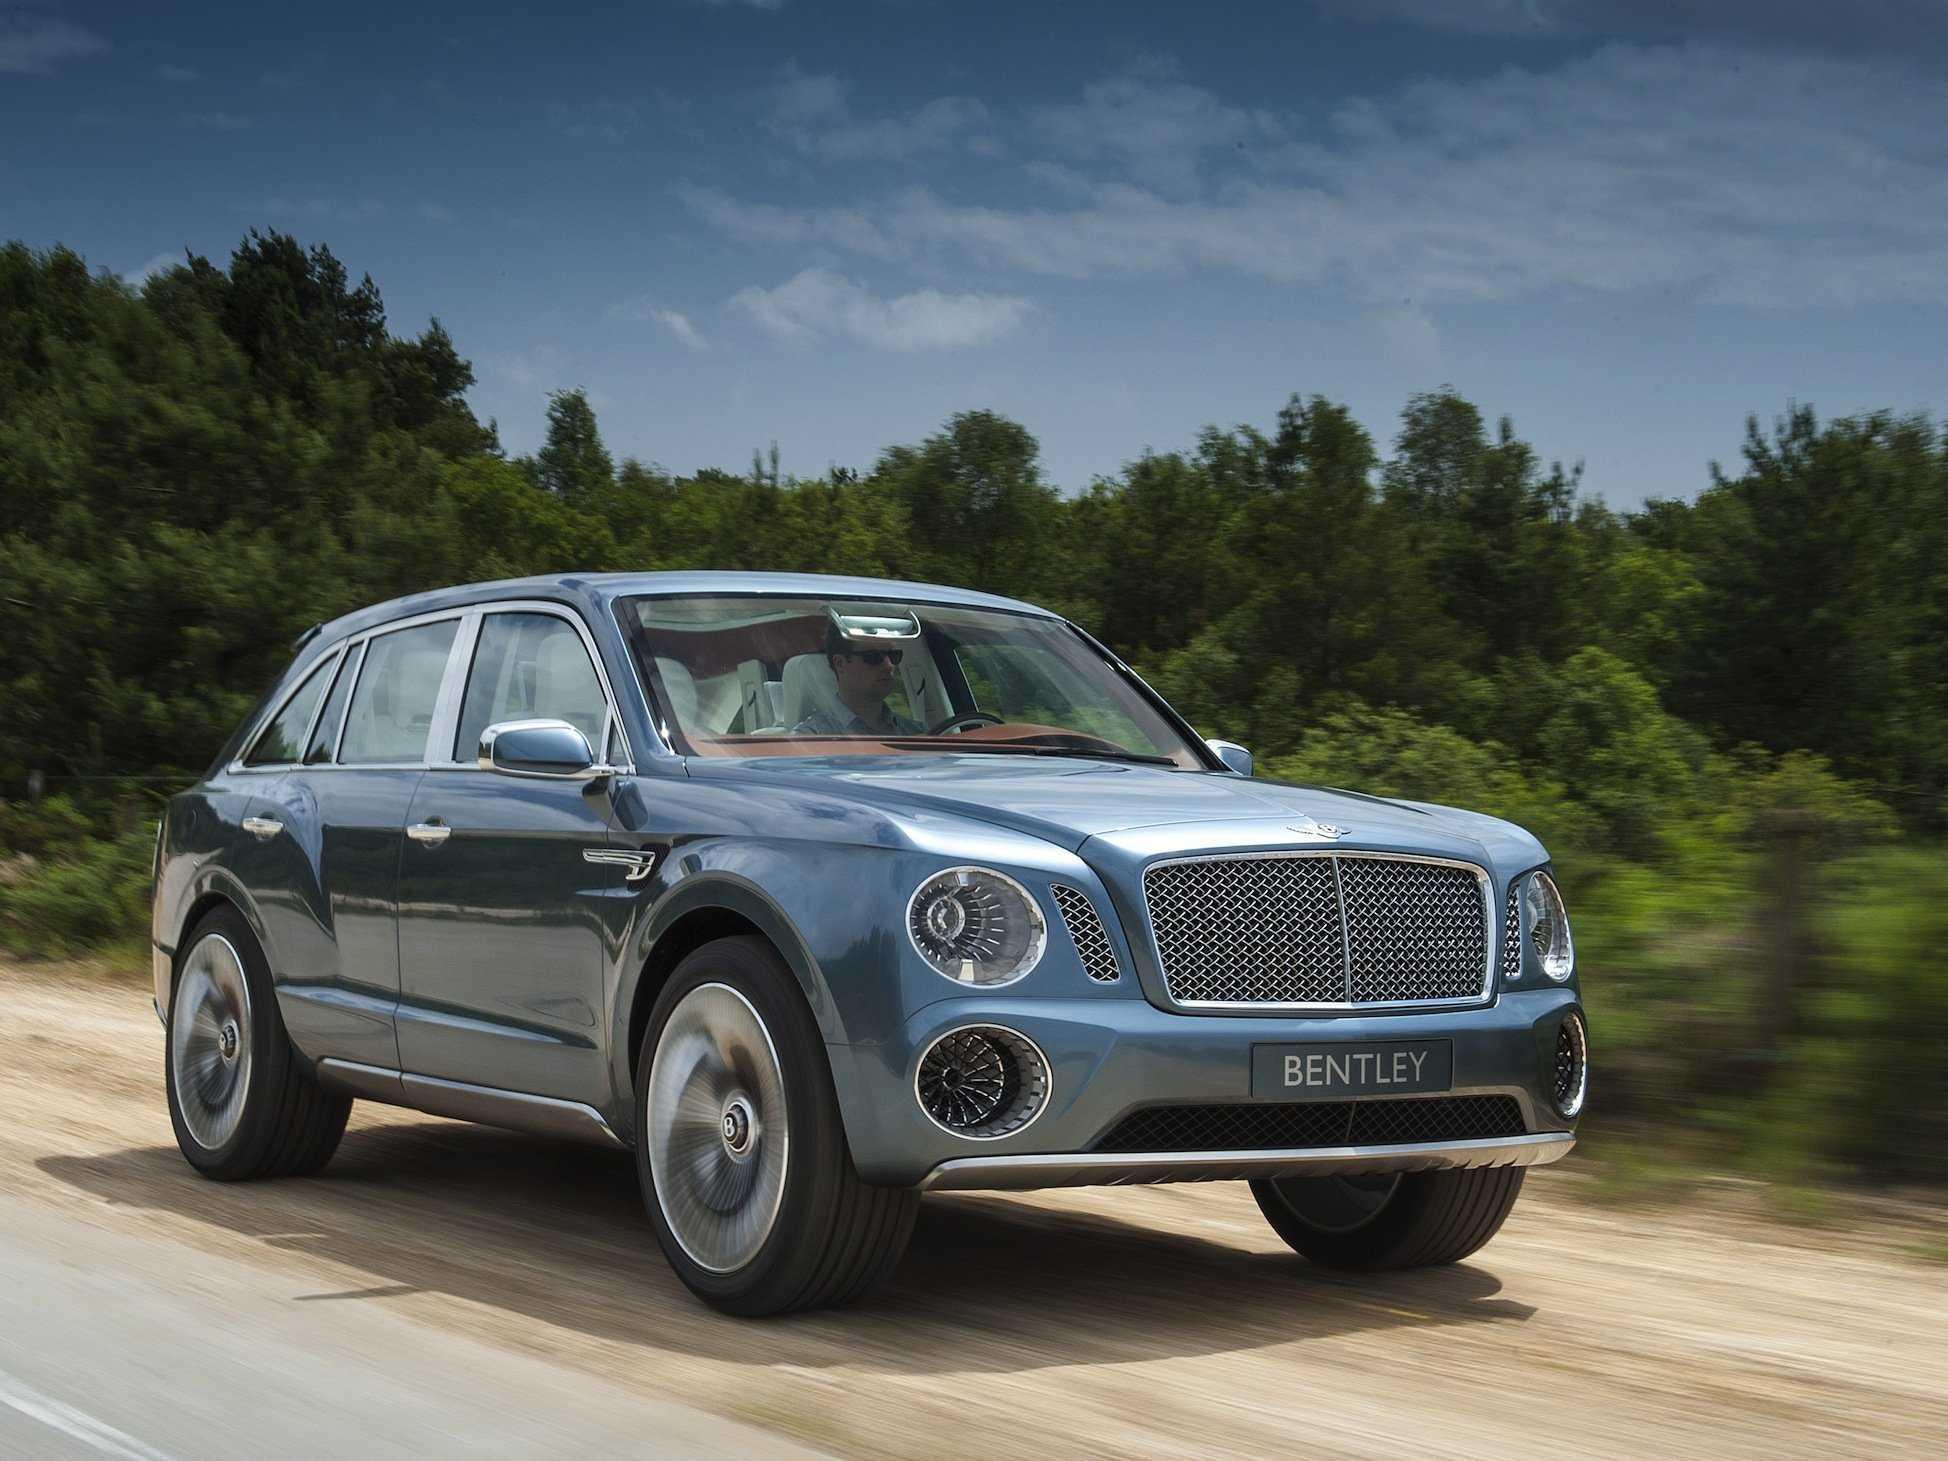 Frankfurt Motor Show 2015 – Top 5 Cars to Look Forward To